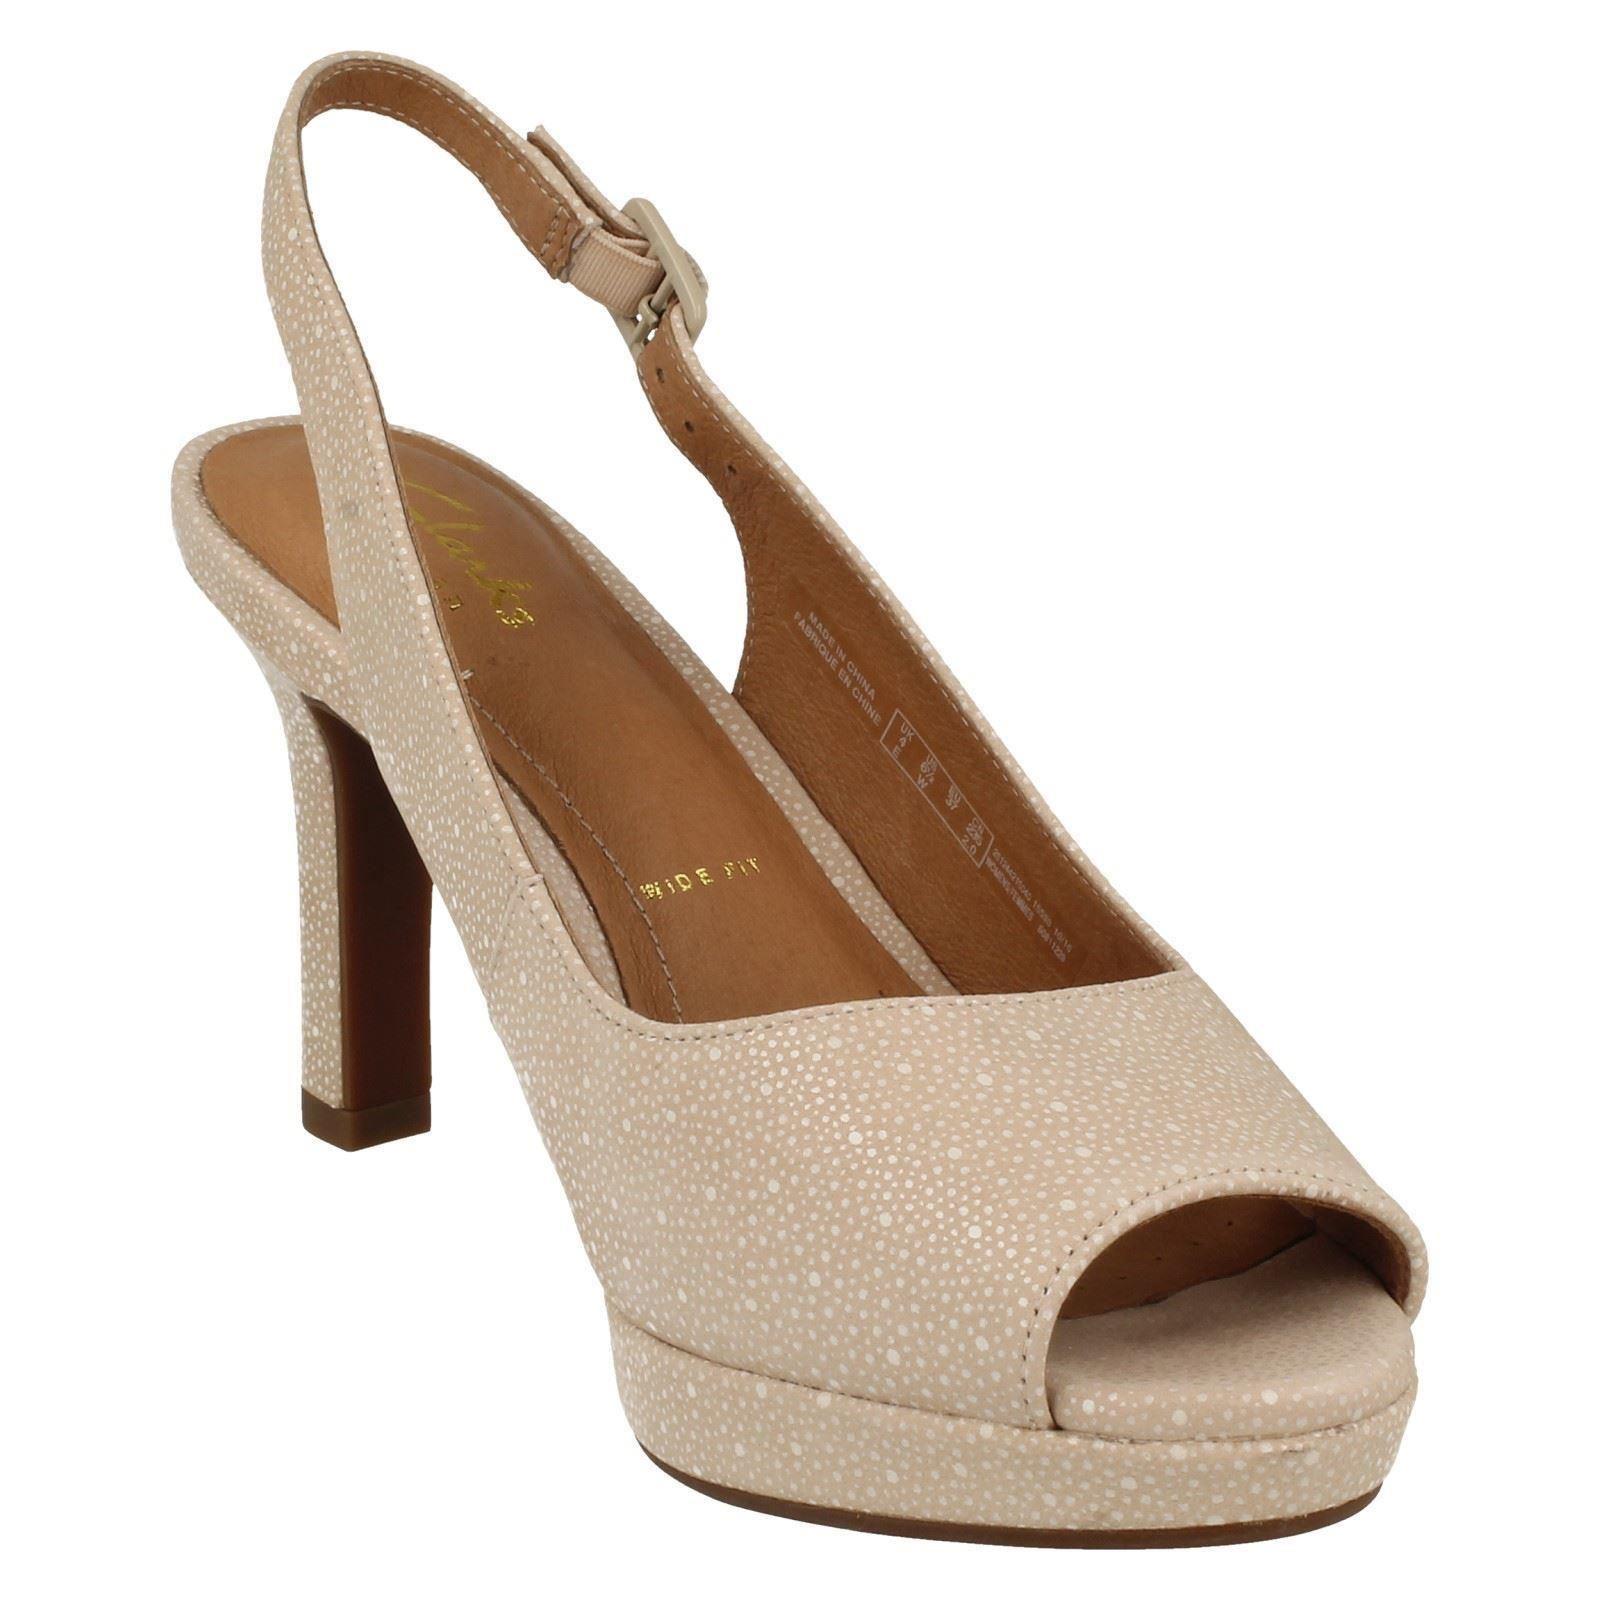 b9938f8ccbd8 Ladies-Clarks-Heeled-Sandals-034-Mayra-Blossom-034 thumbnail